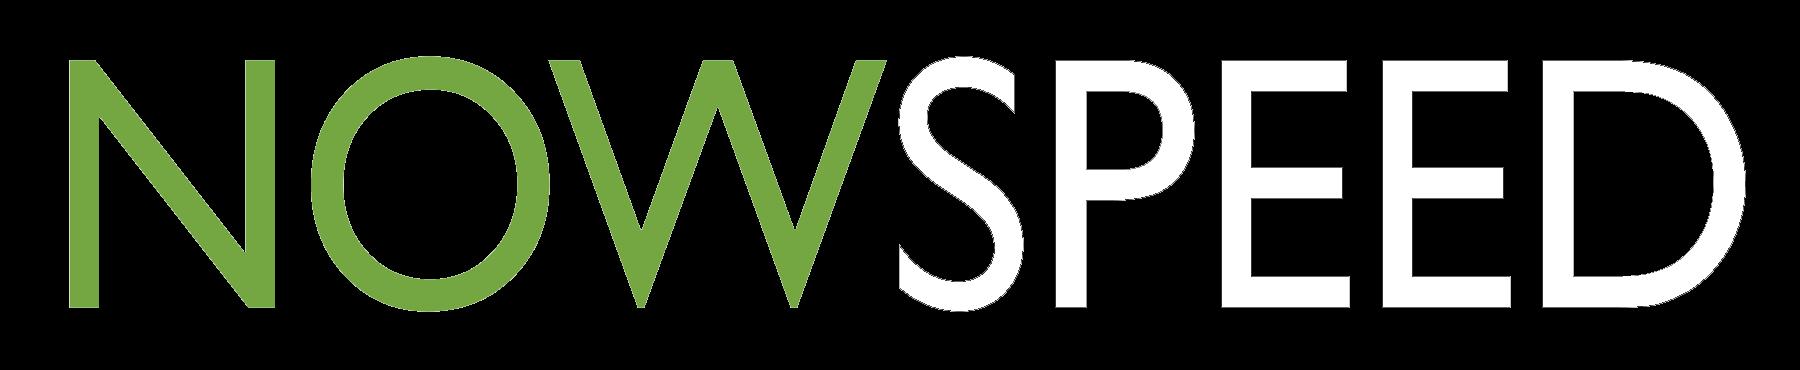 "David Reske and Jillian Wallace to Present Video Webinar on ""Social Media Insights from 700+ Companies"""